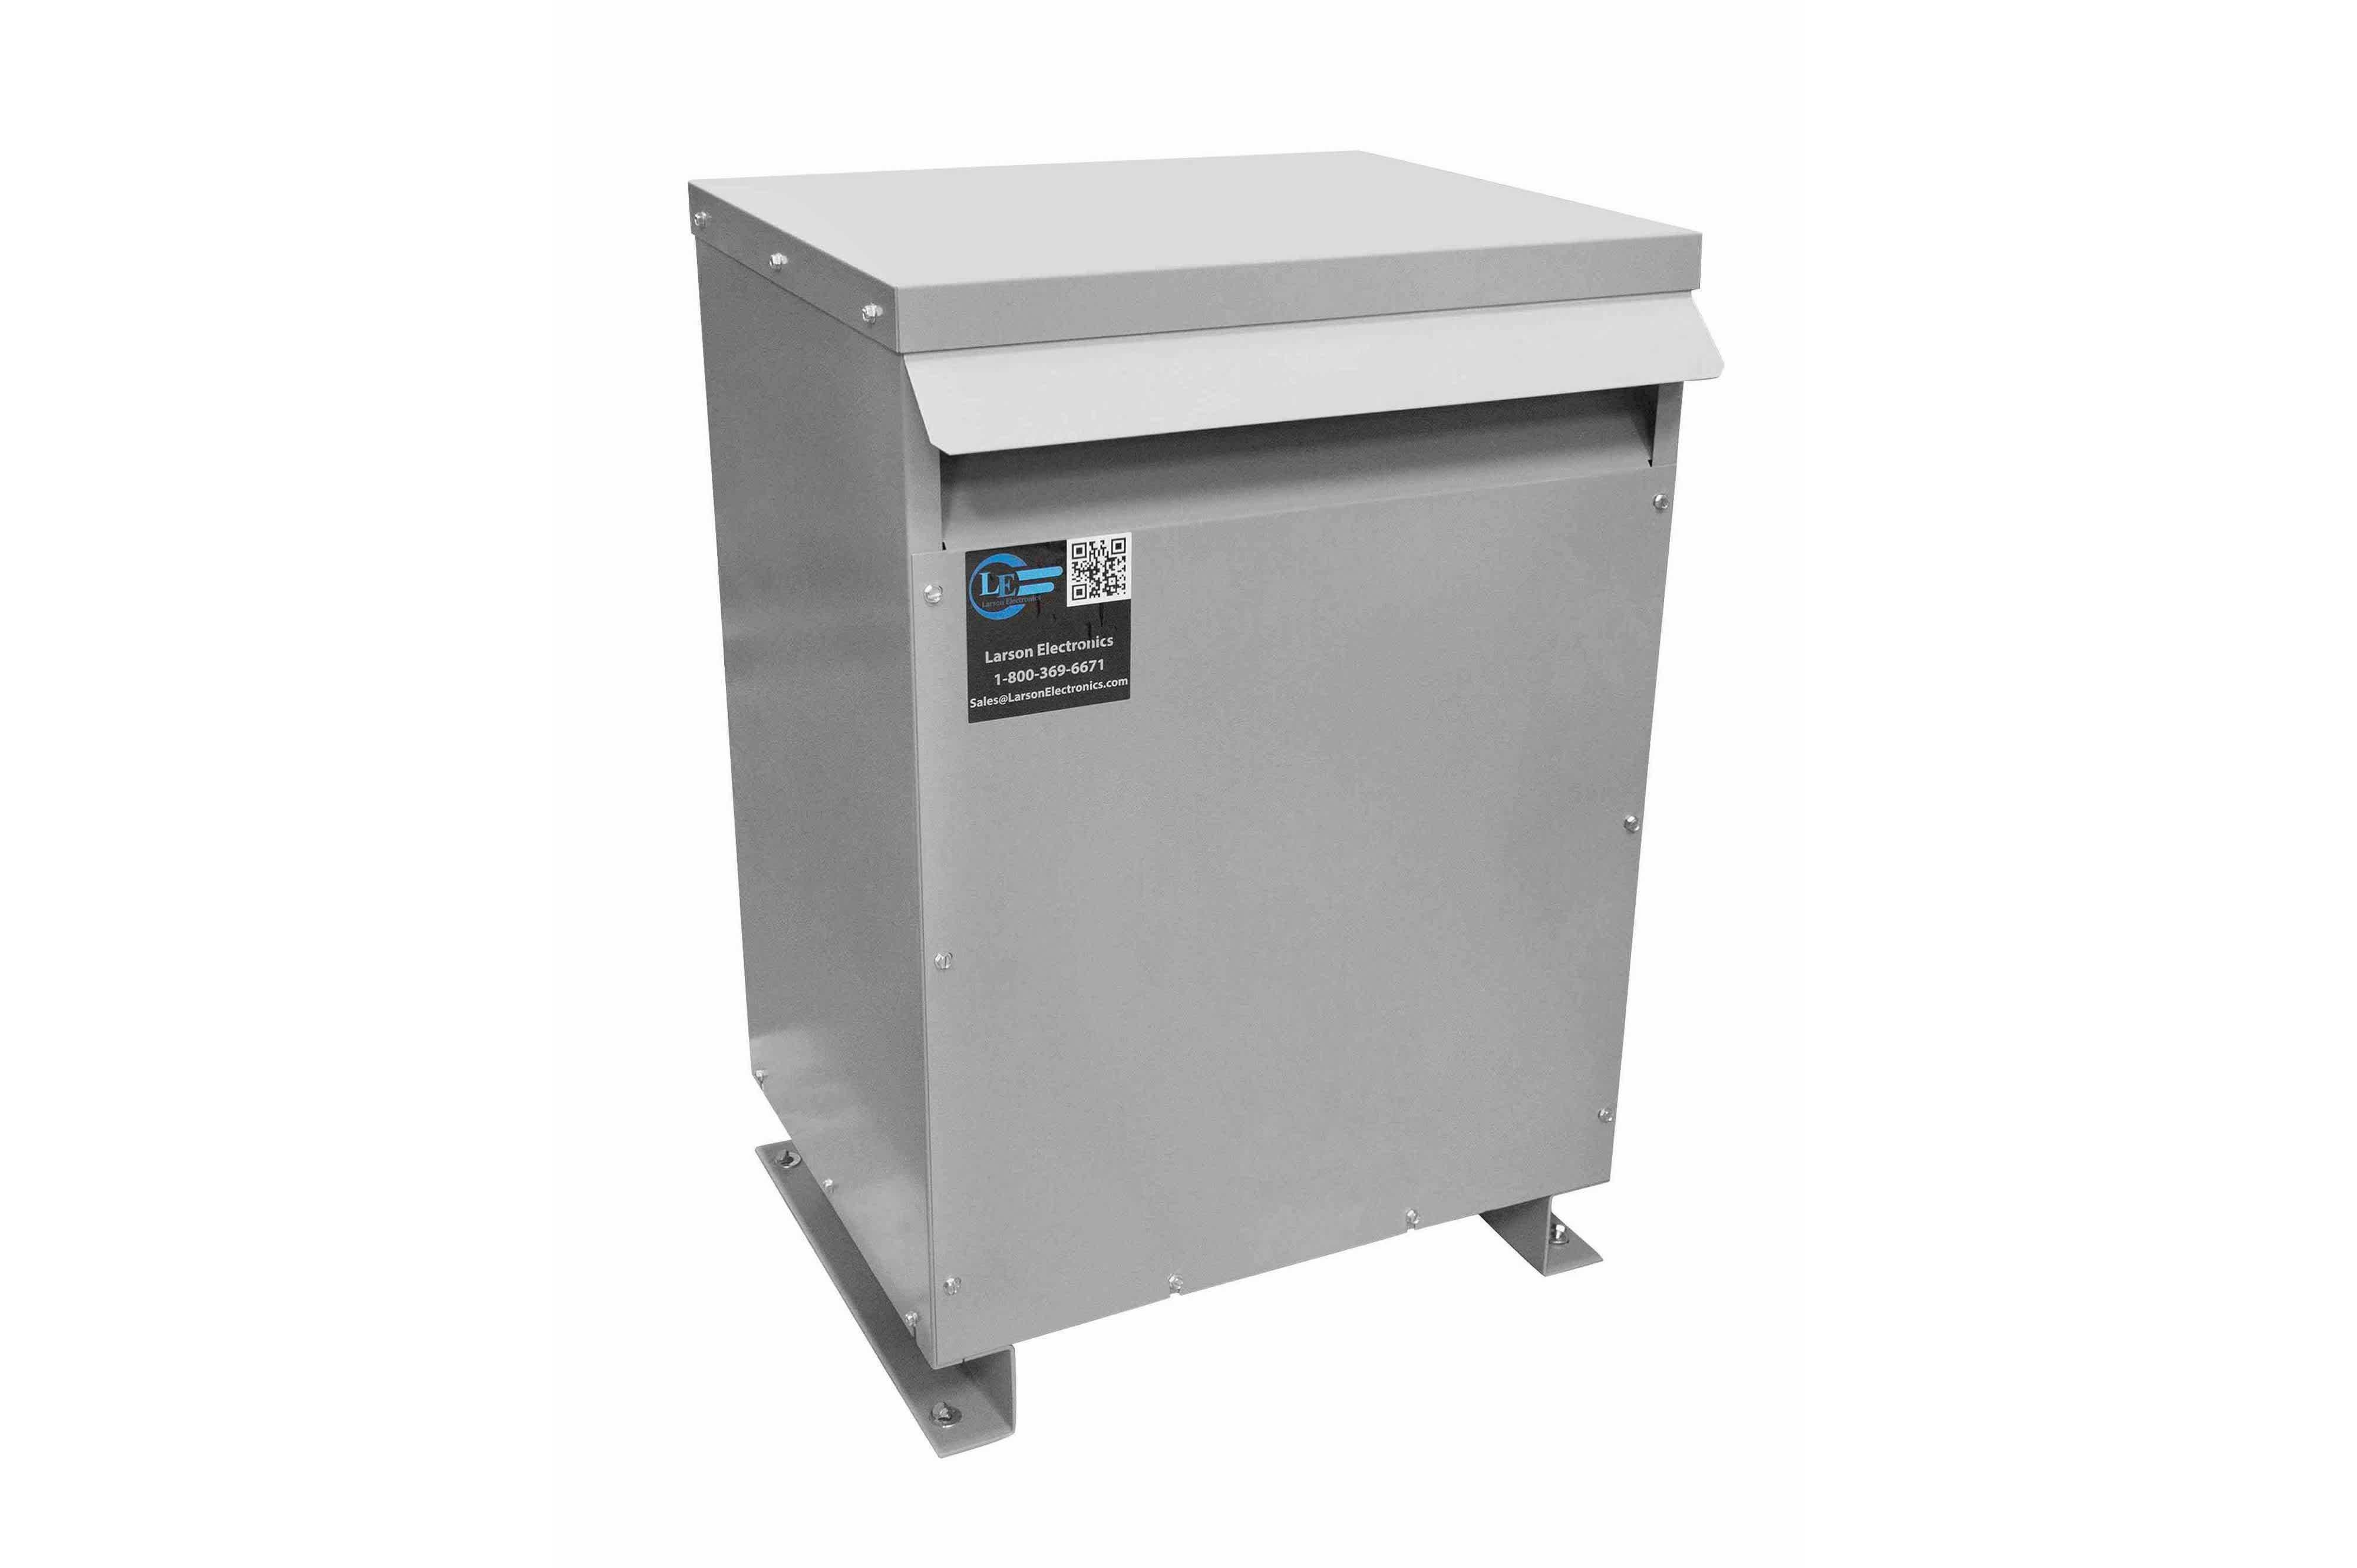 52.5 kVA 3PH Isolation Transformer, 600V Wye Primary, 380Y/220 Wye-N Secondary, N3R, Ventilated, 60 Hz